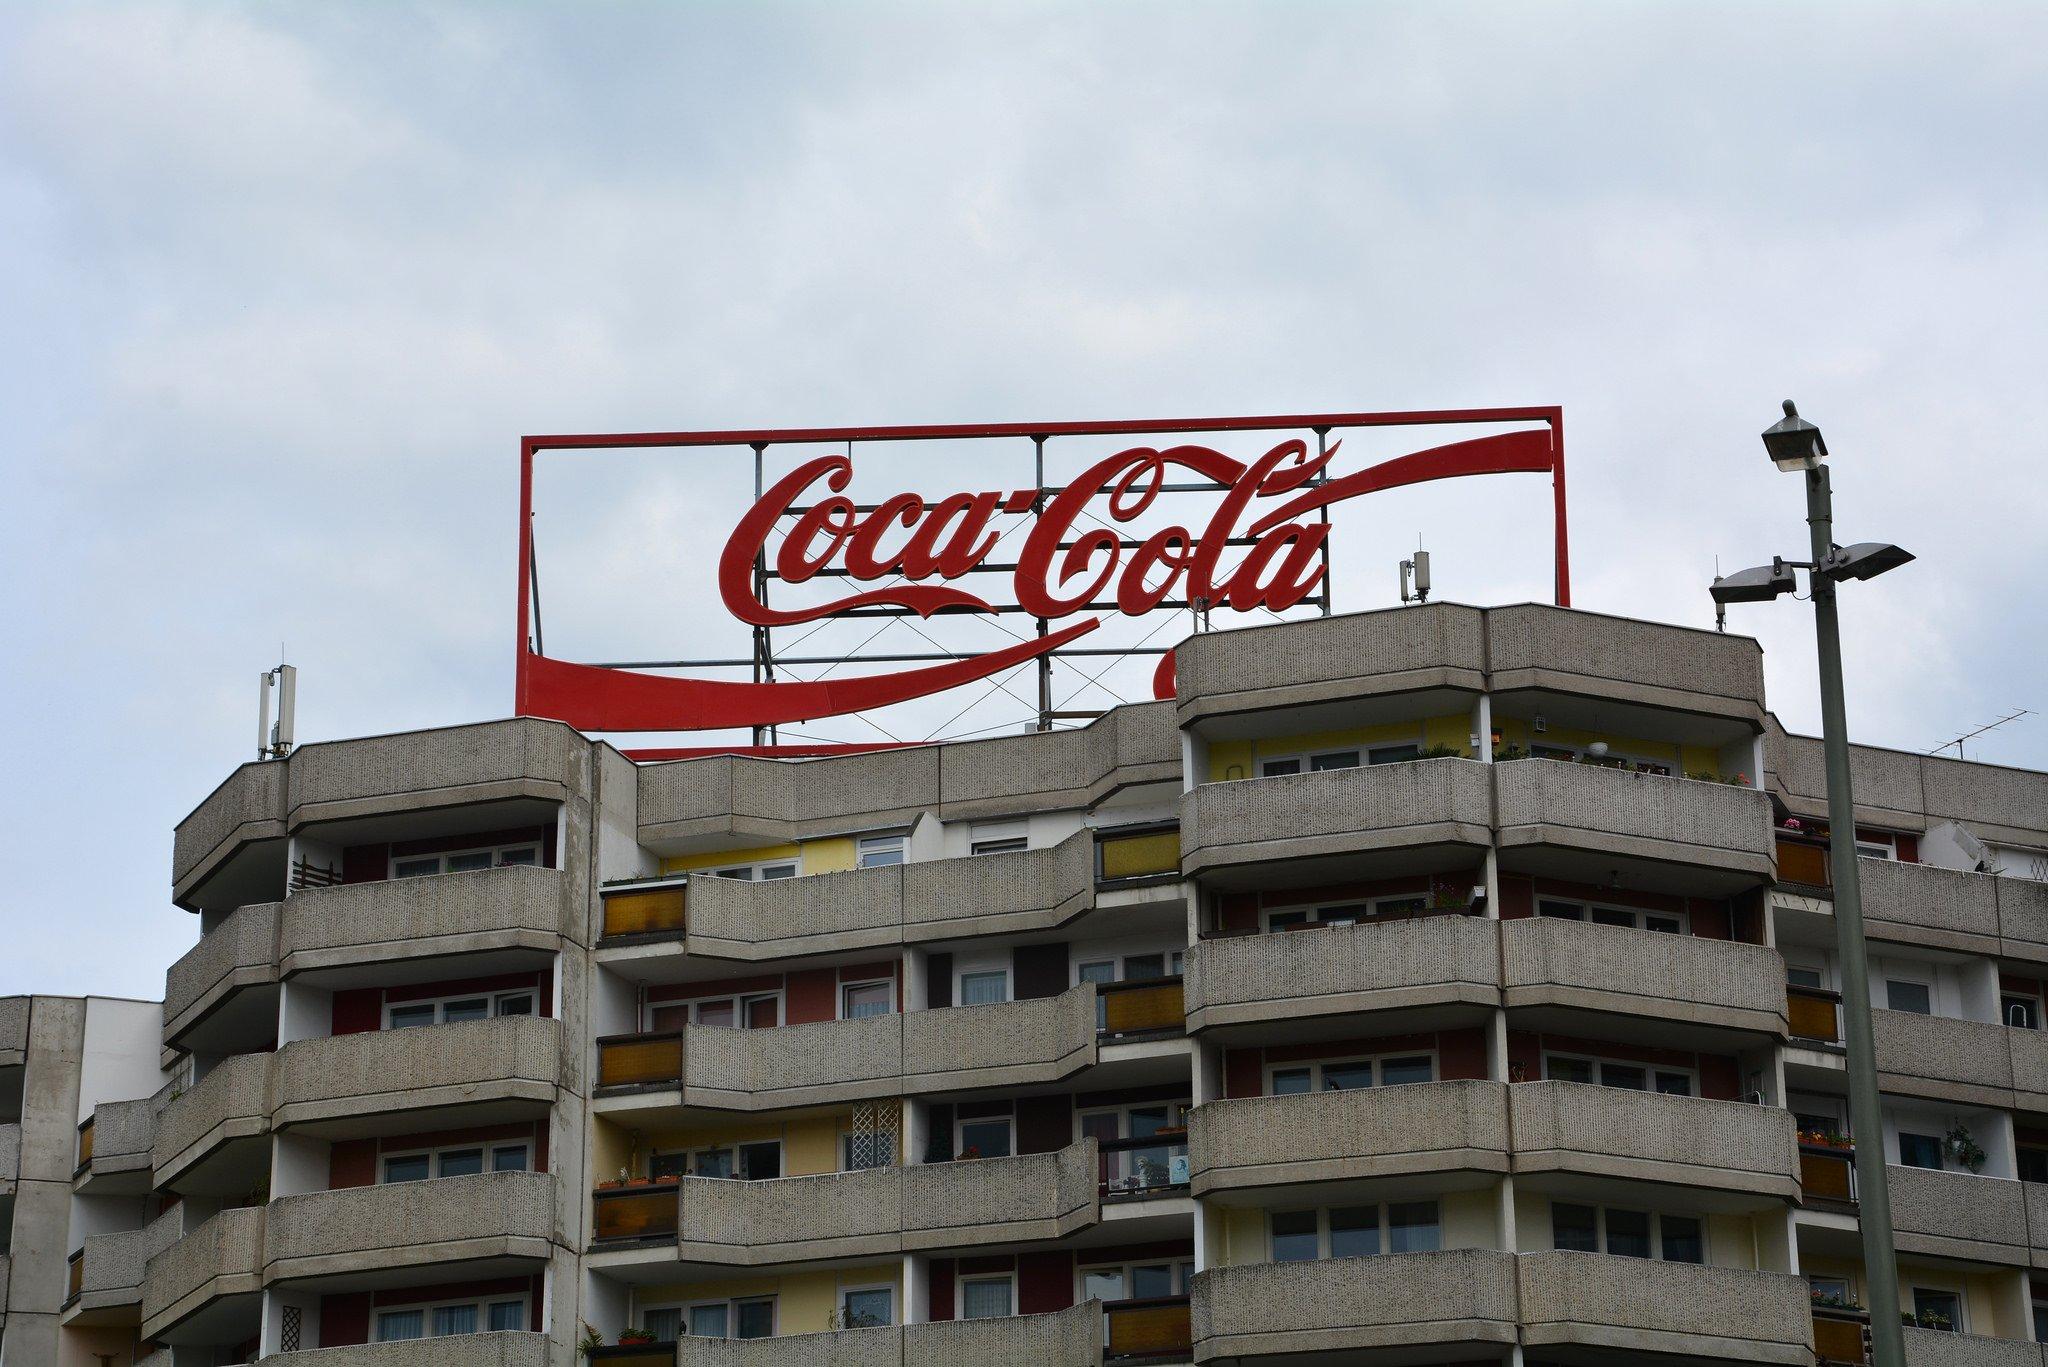 Coca Cola Angebot Berlin : 111 places in berlin nr 205 the spitteleck digital cosmonaut ~ Yasmunasinghe.com Haus und Dekorationen